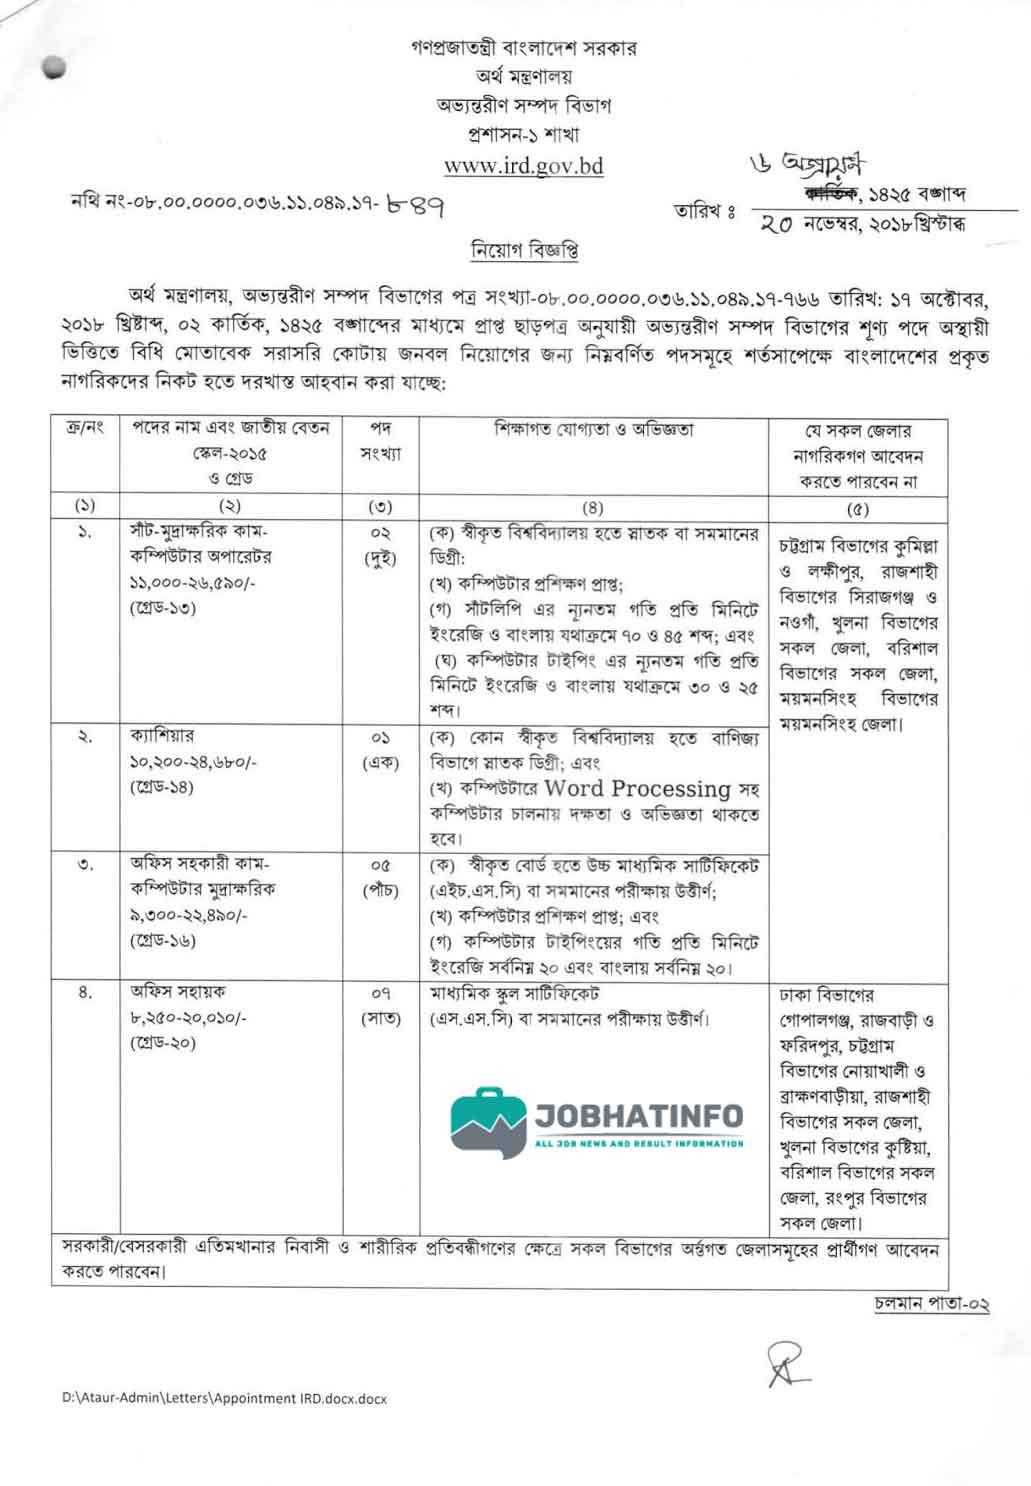 IRD Job Circular 2020 | Internal Resources Division | Apply on ird.teletalk.com.bd 1